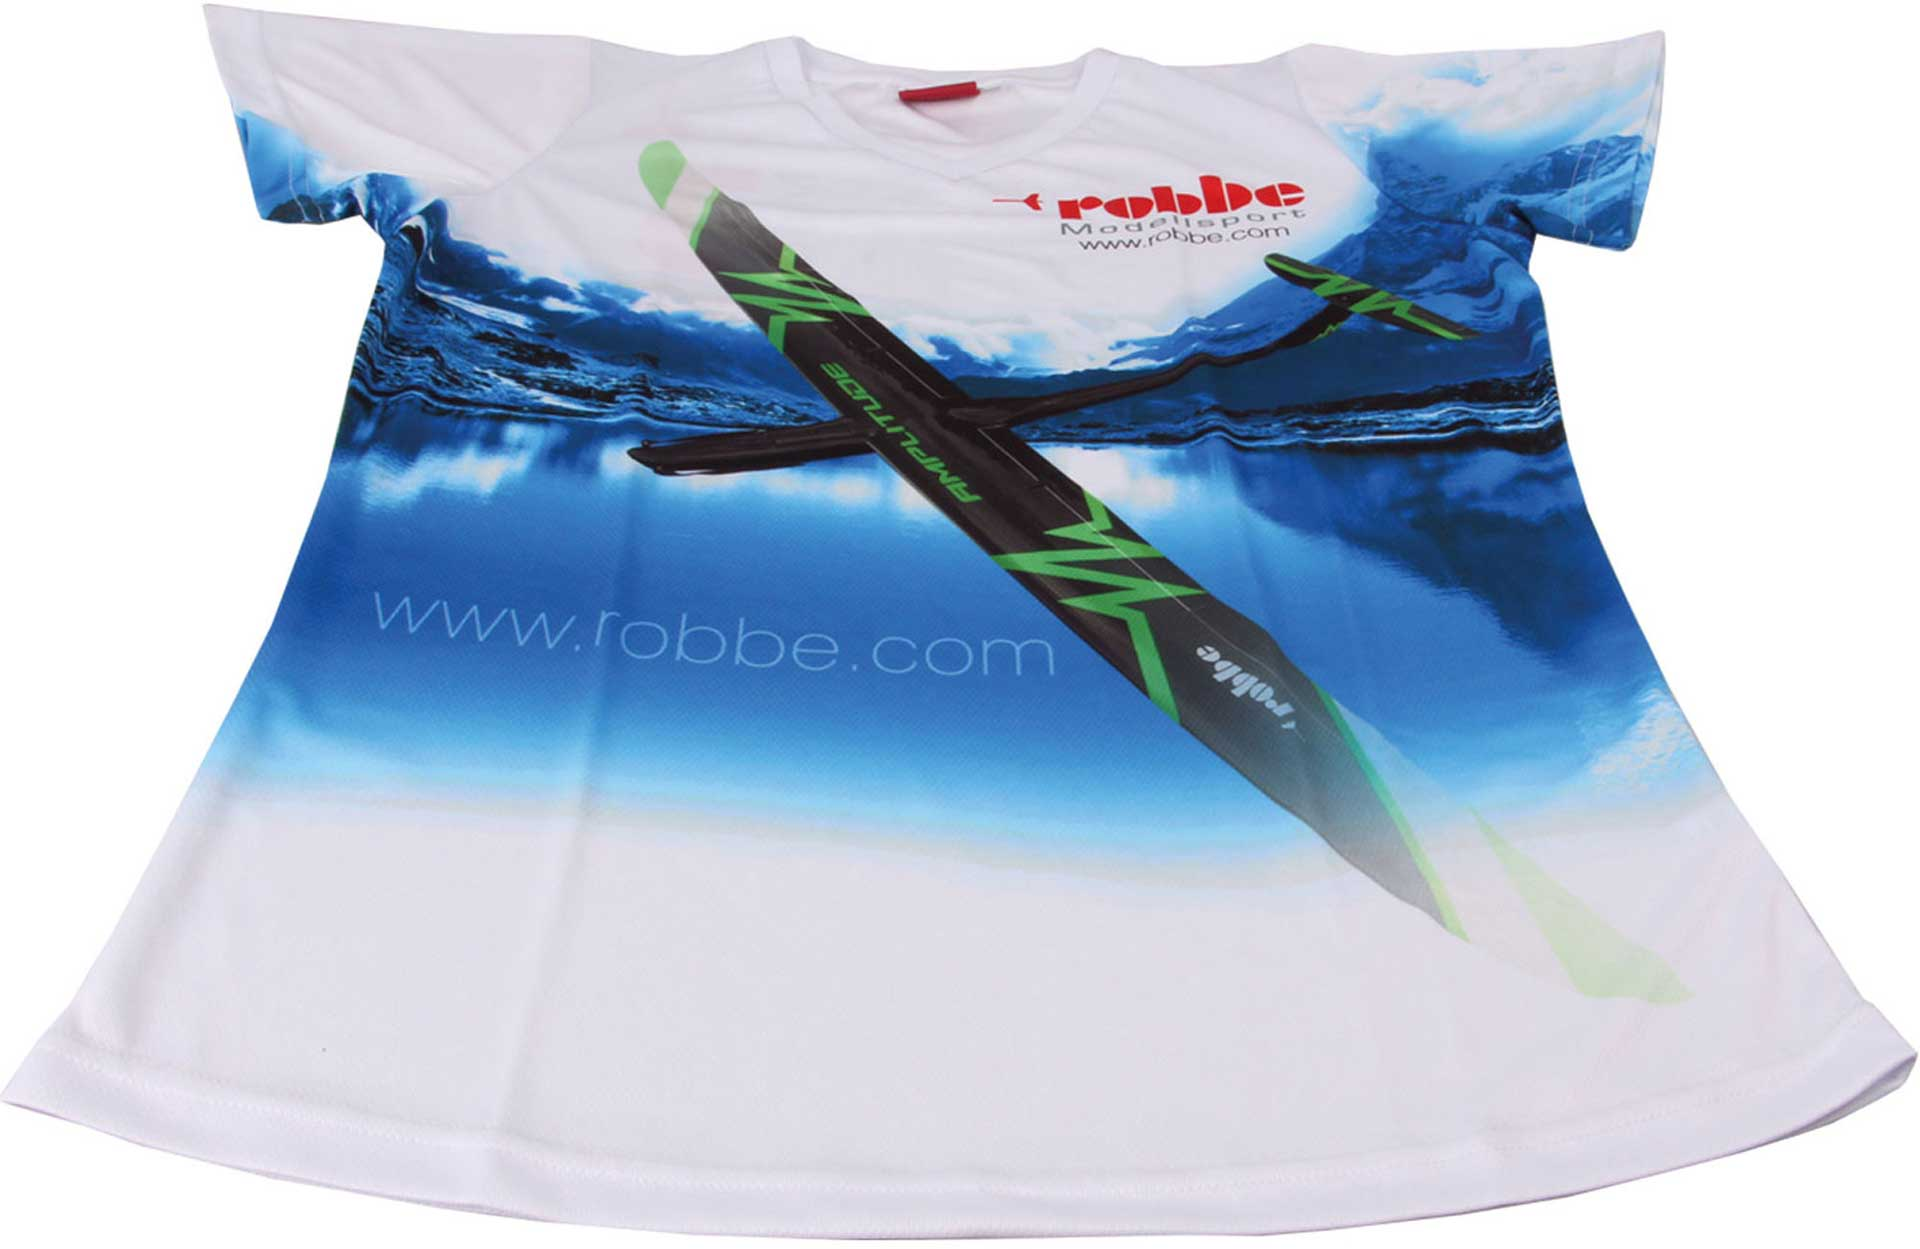 "Robbe Modellsport FUNKTIONS T-SHIRT ""AMPLITUDE"" ROBBE GRÖSSE M"